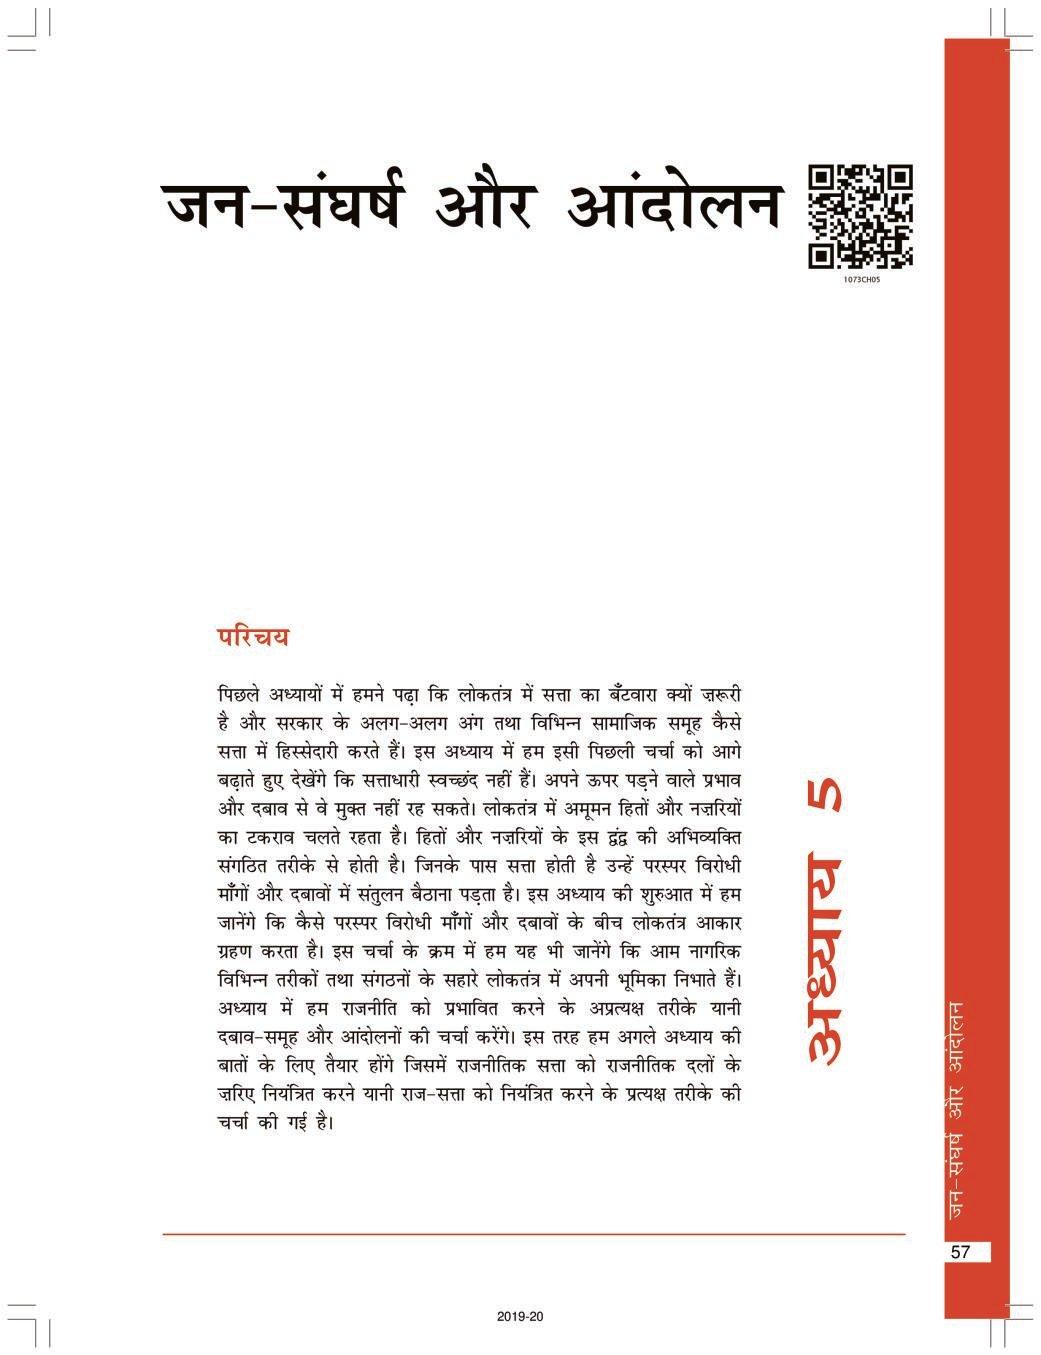 NCERT Book Class 10 Social Science (नागरिकशास्त्र) Chapter 5 जन-संघर्ष और आंदोलन - Page 1